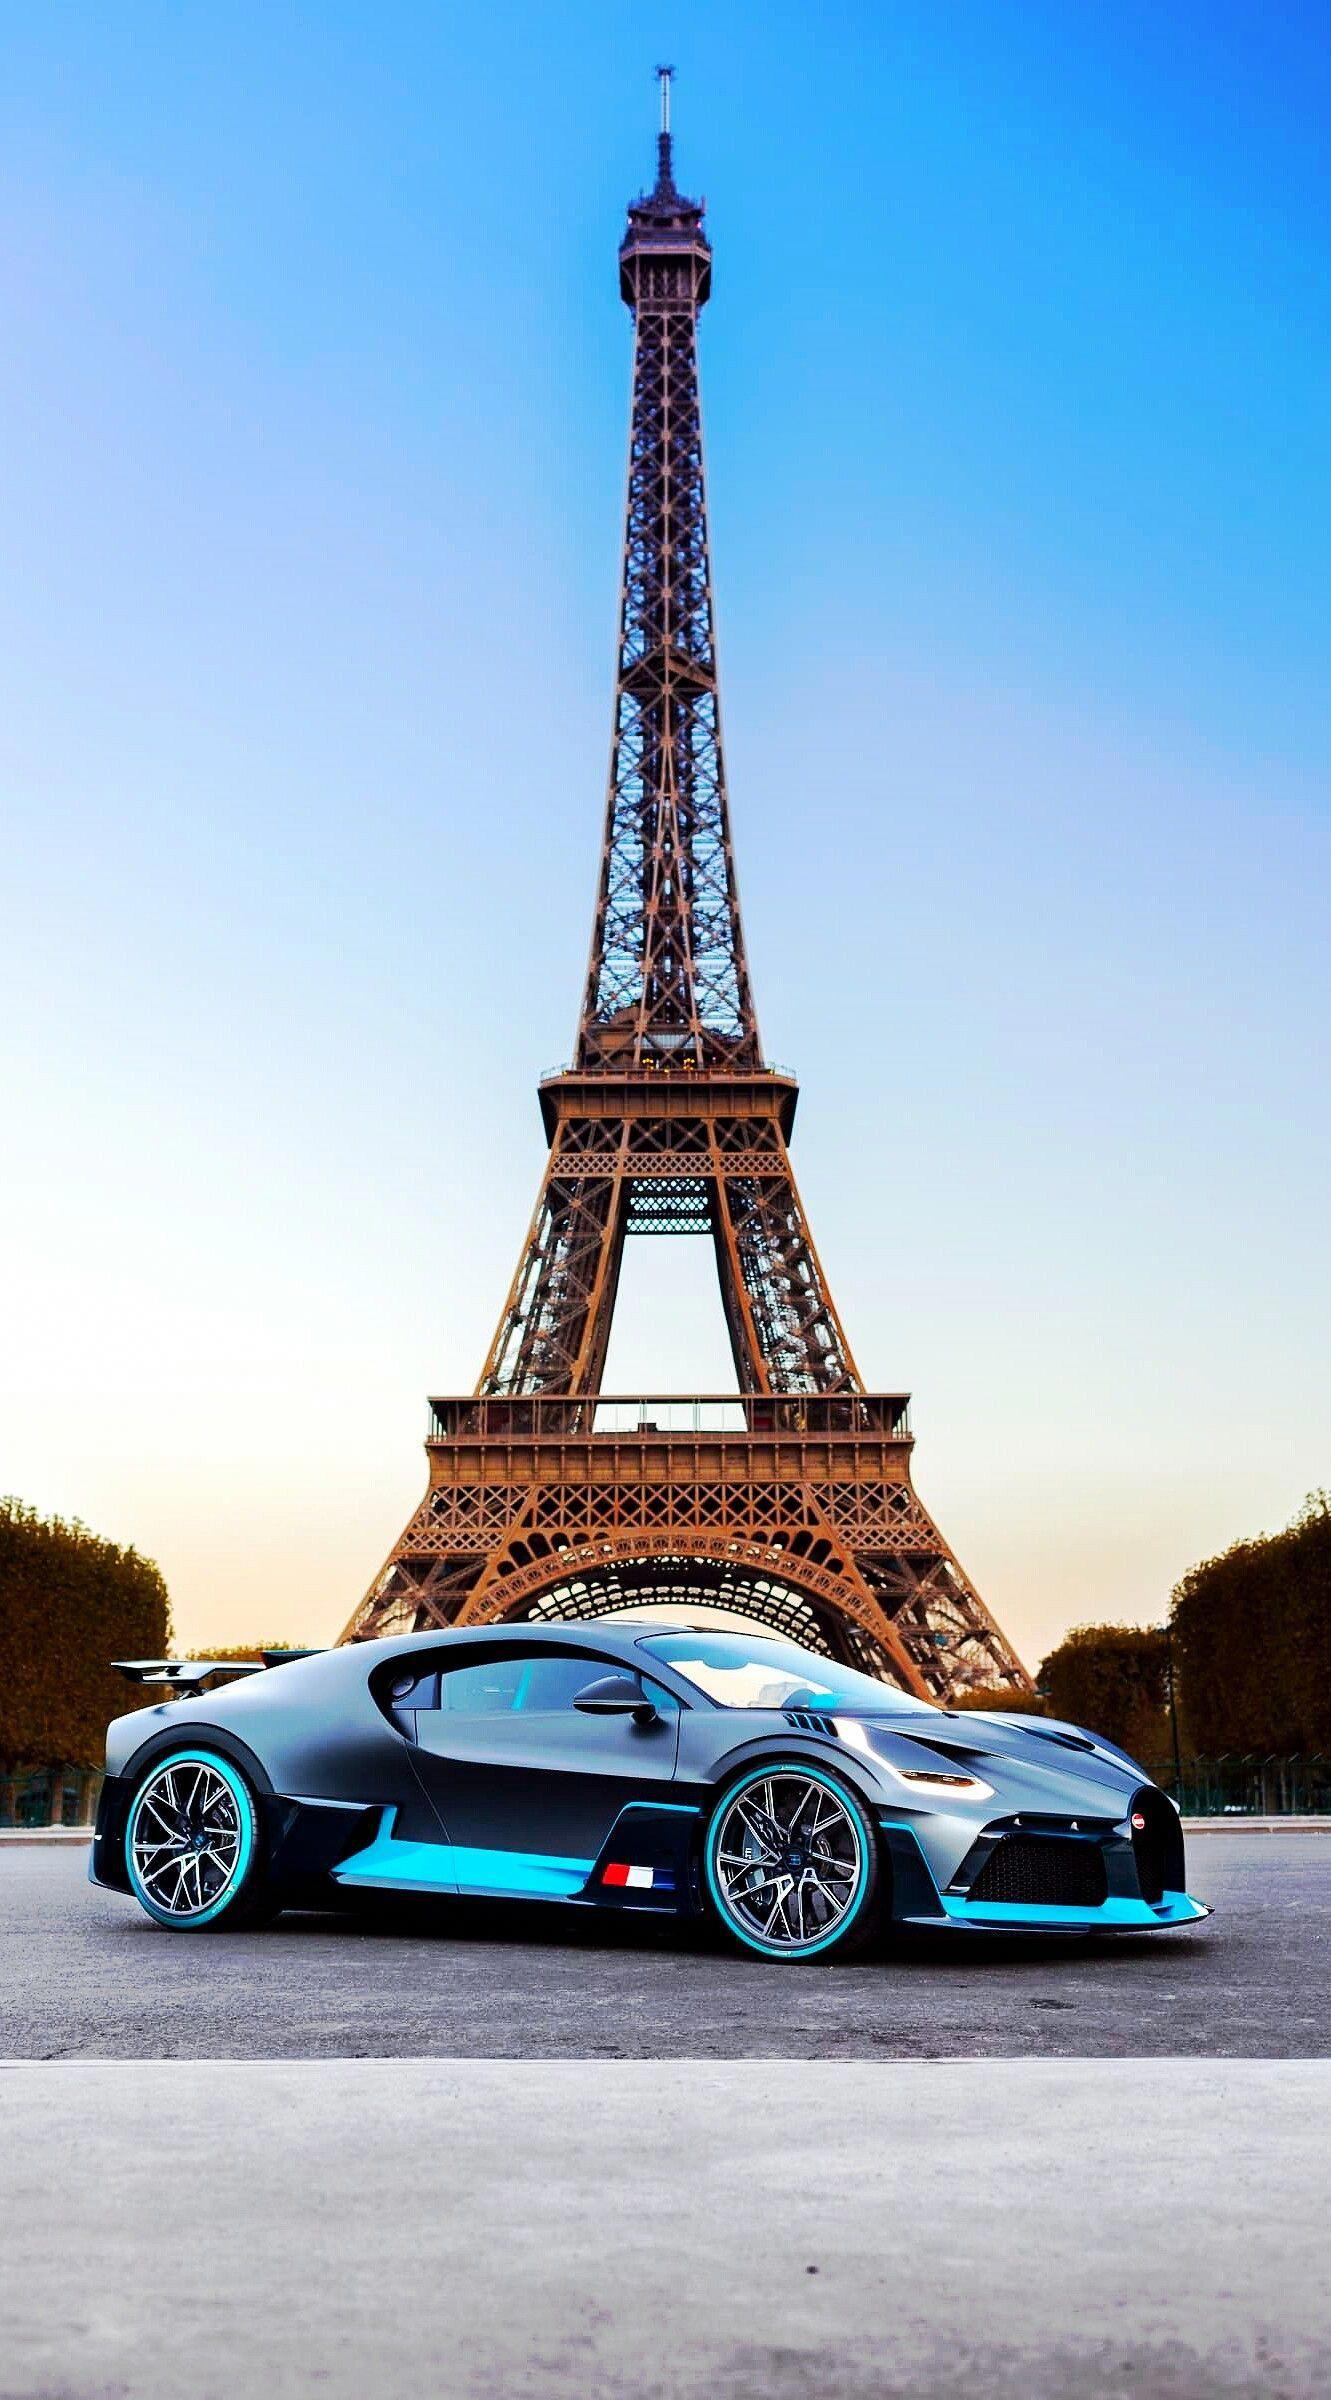 2019 Bugatti Divo At The Eiffel Tower Enhanced By Keely Vonmonski Newsportscars Luxurysportcar Newsp Bugatti Cars Cars Bugatti Veyron Super Car Bugatti